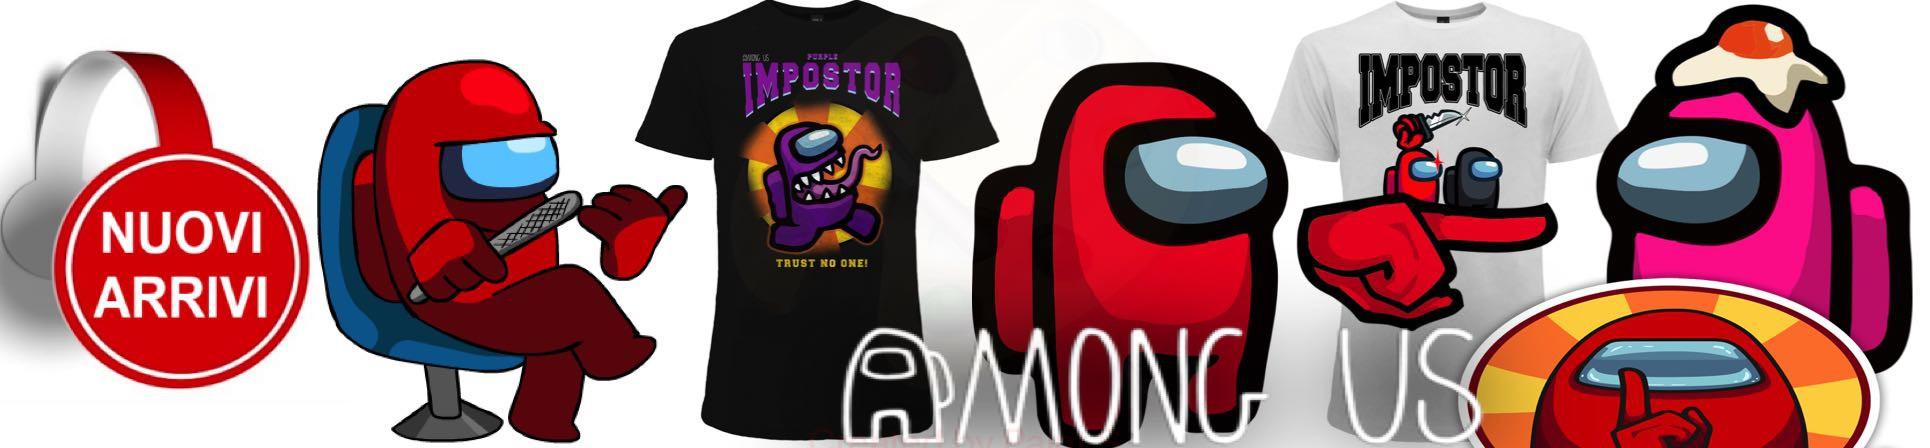 vendita online t-shirt Among us